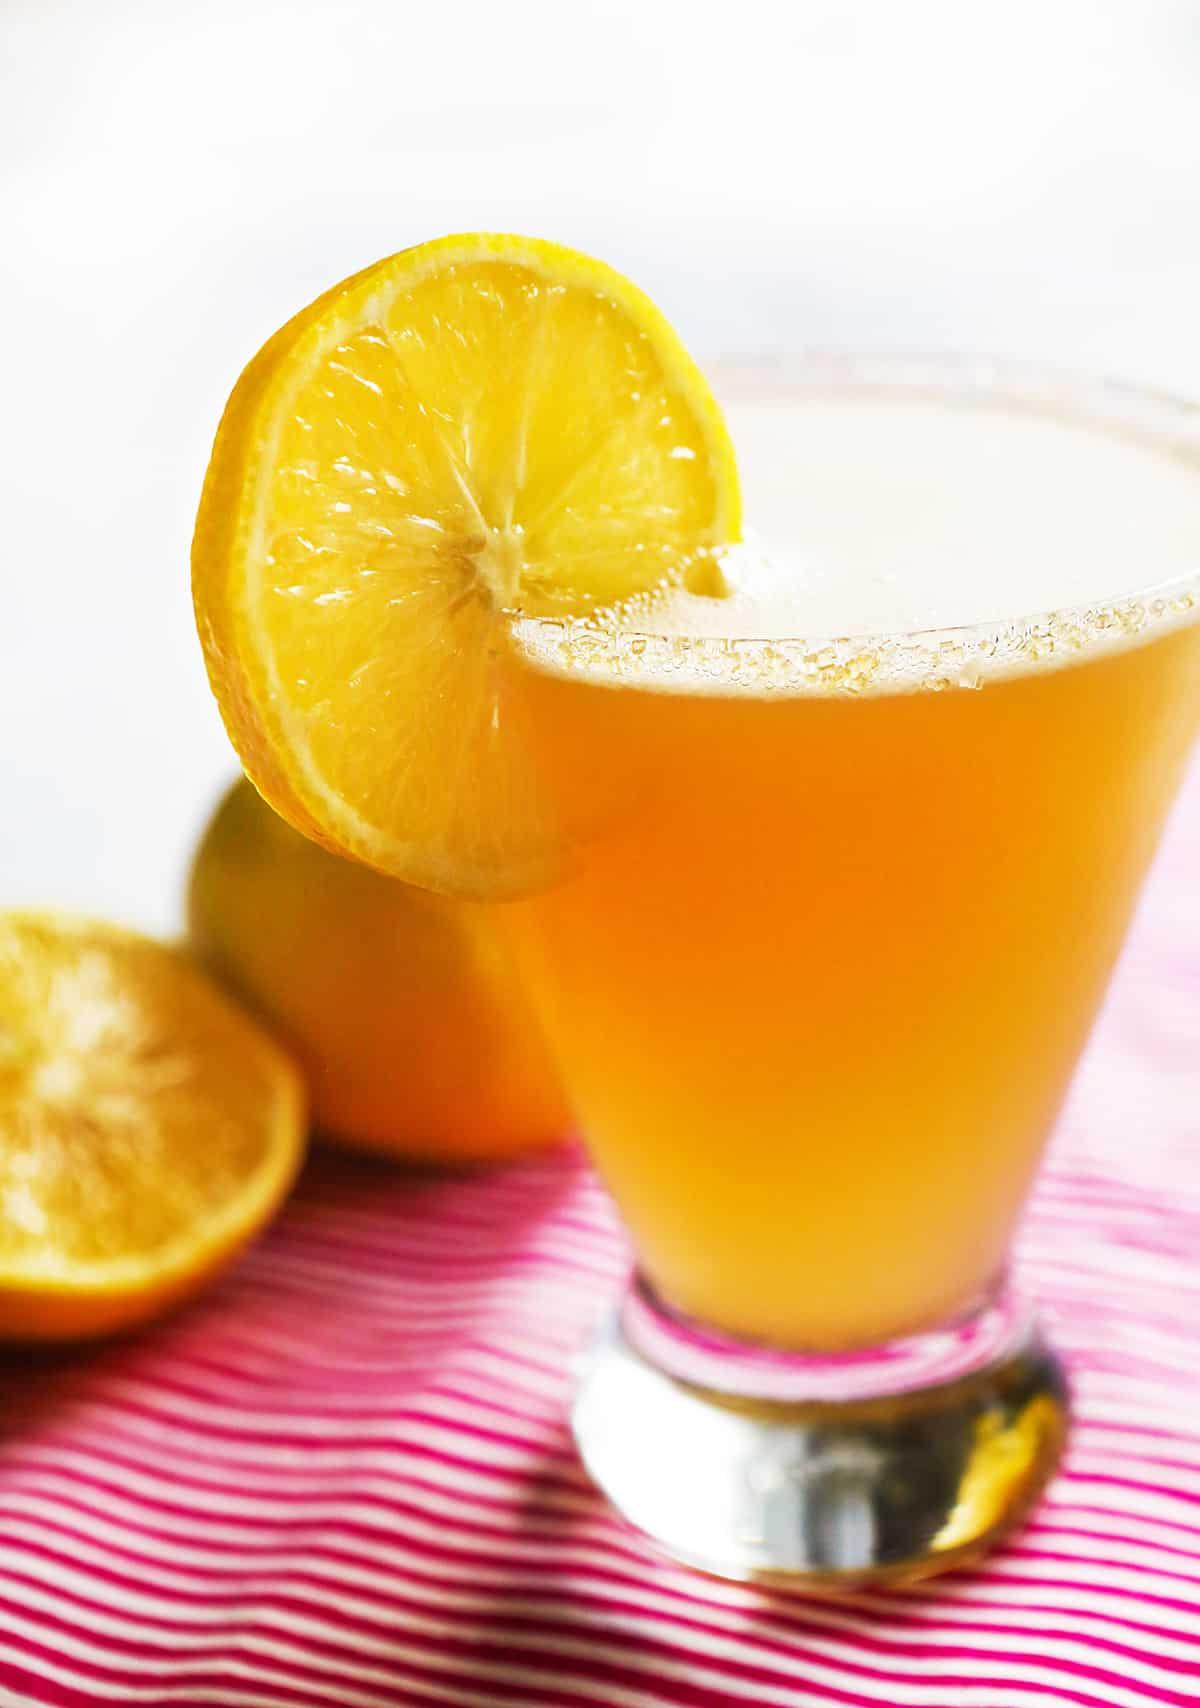 Close up of a lemon drop cocktail next to lemons.